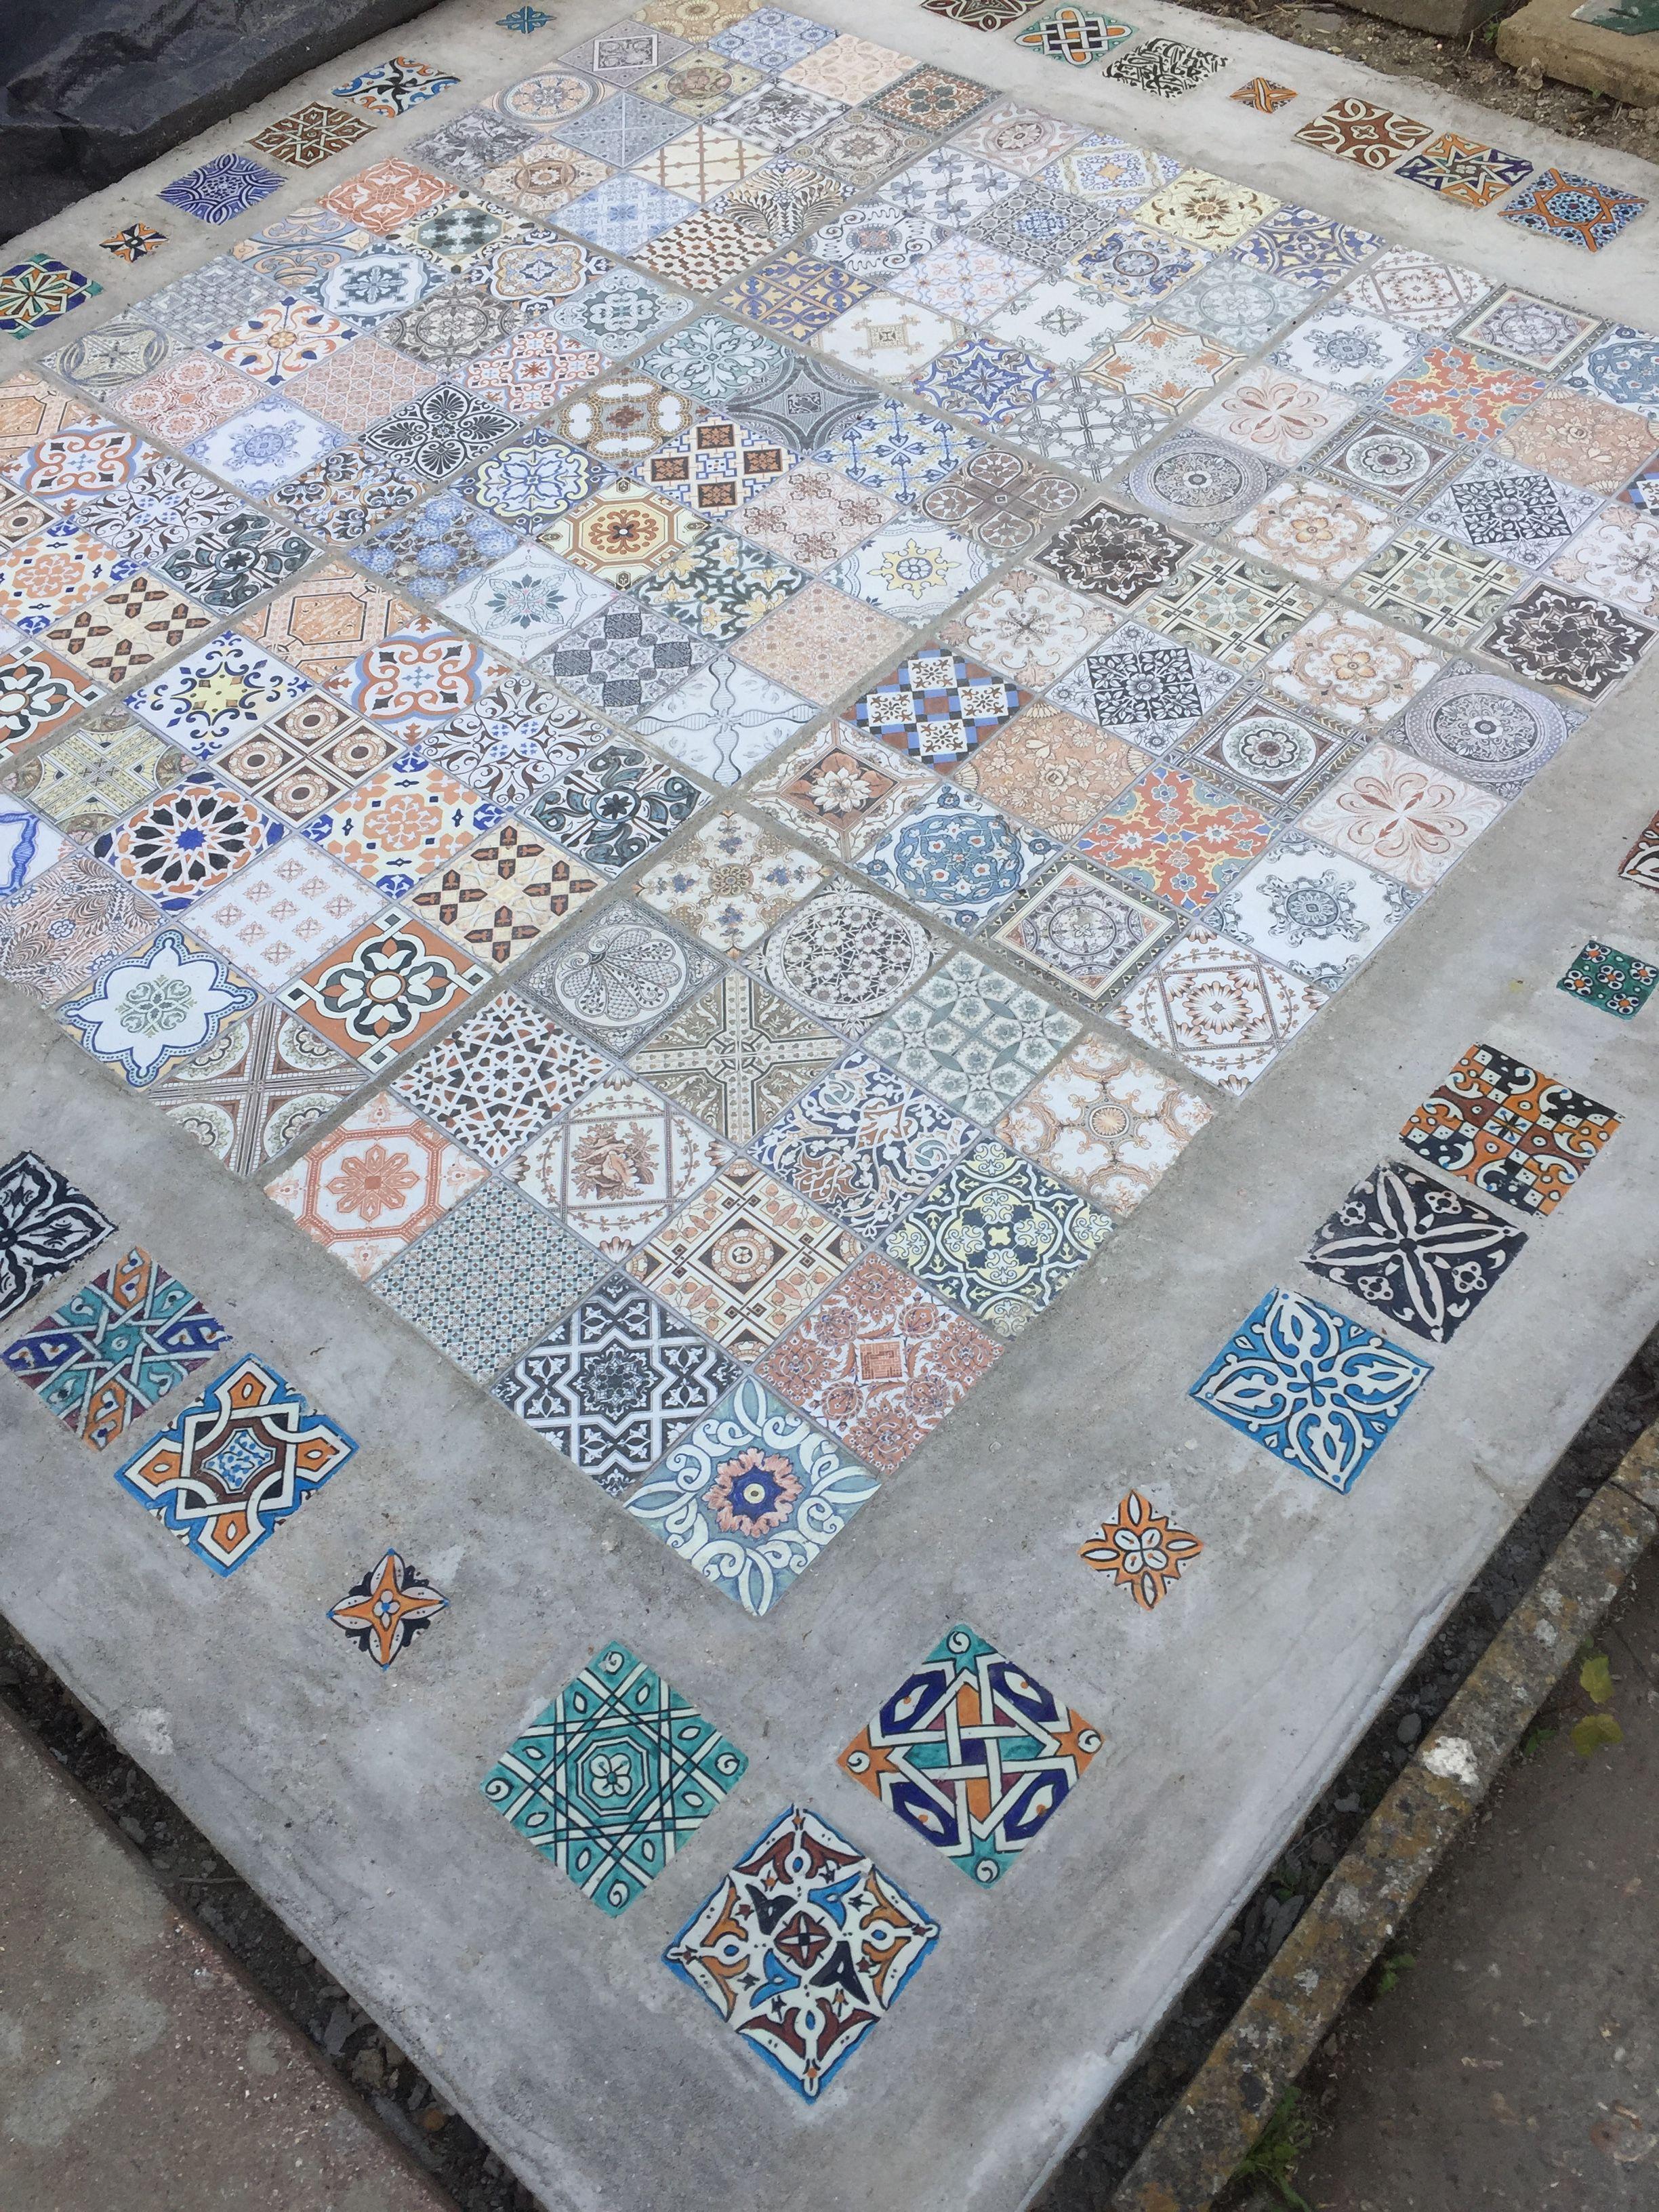 Moroccan Tiles Outdoor Patio Terrace Set In Concrete Outdoor